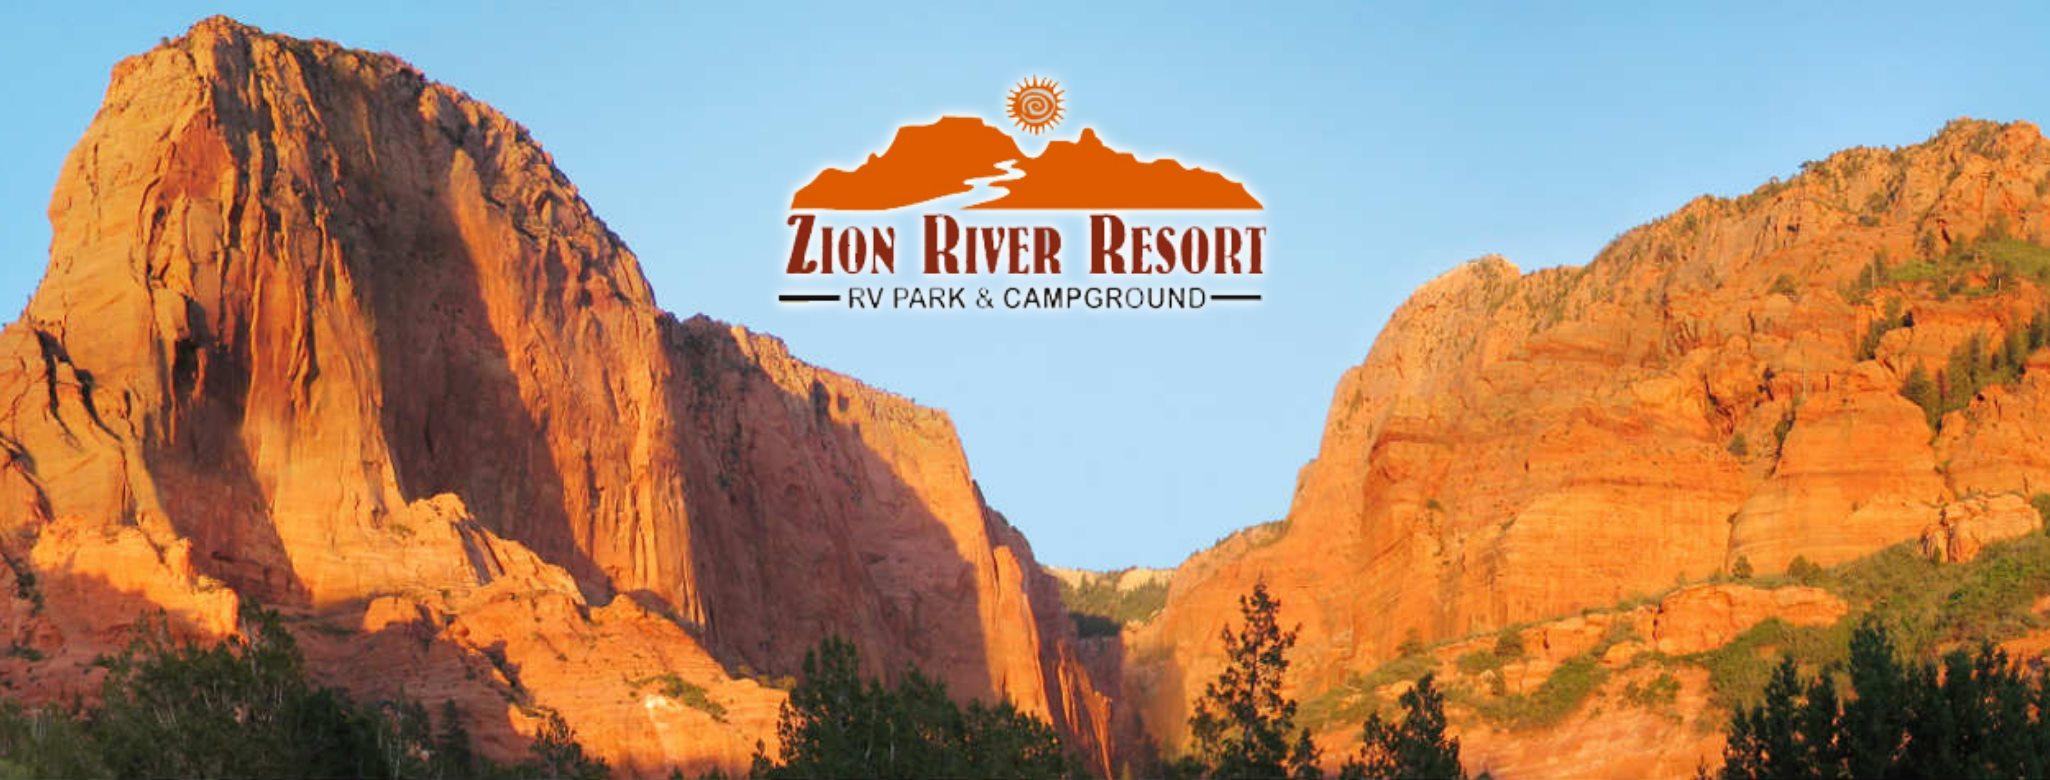 Zion River Resort